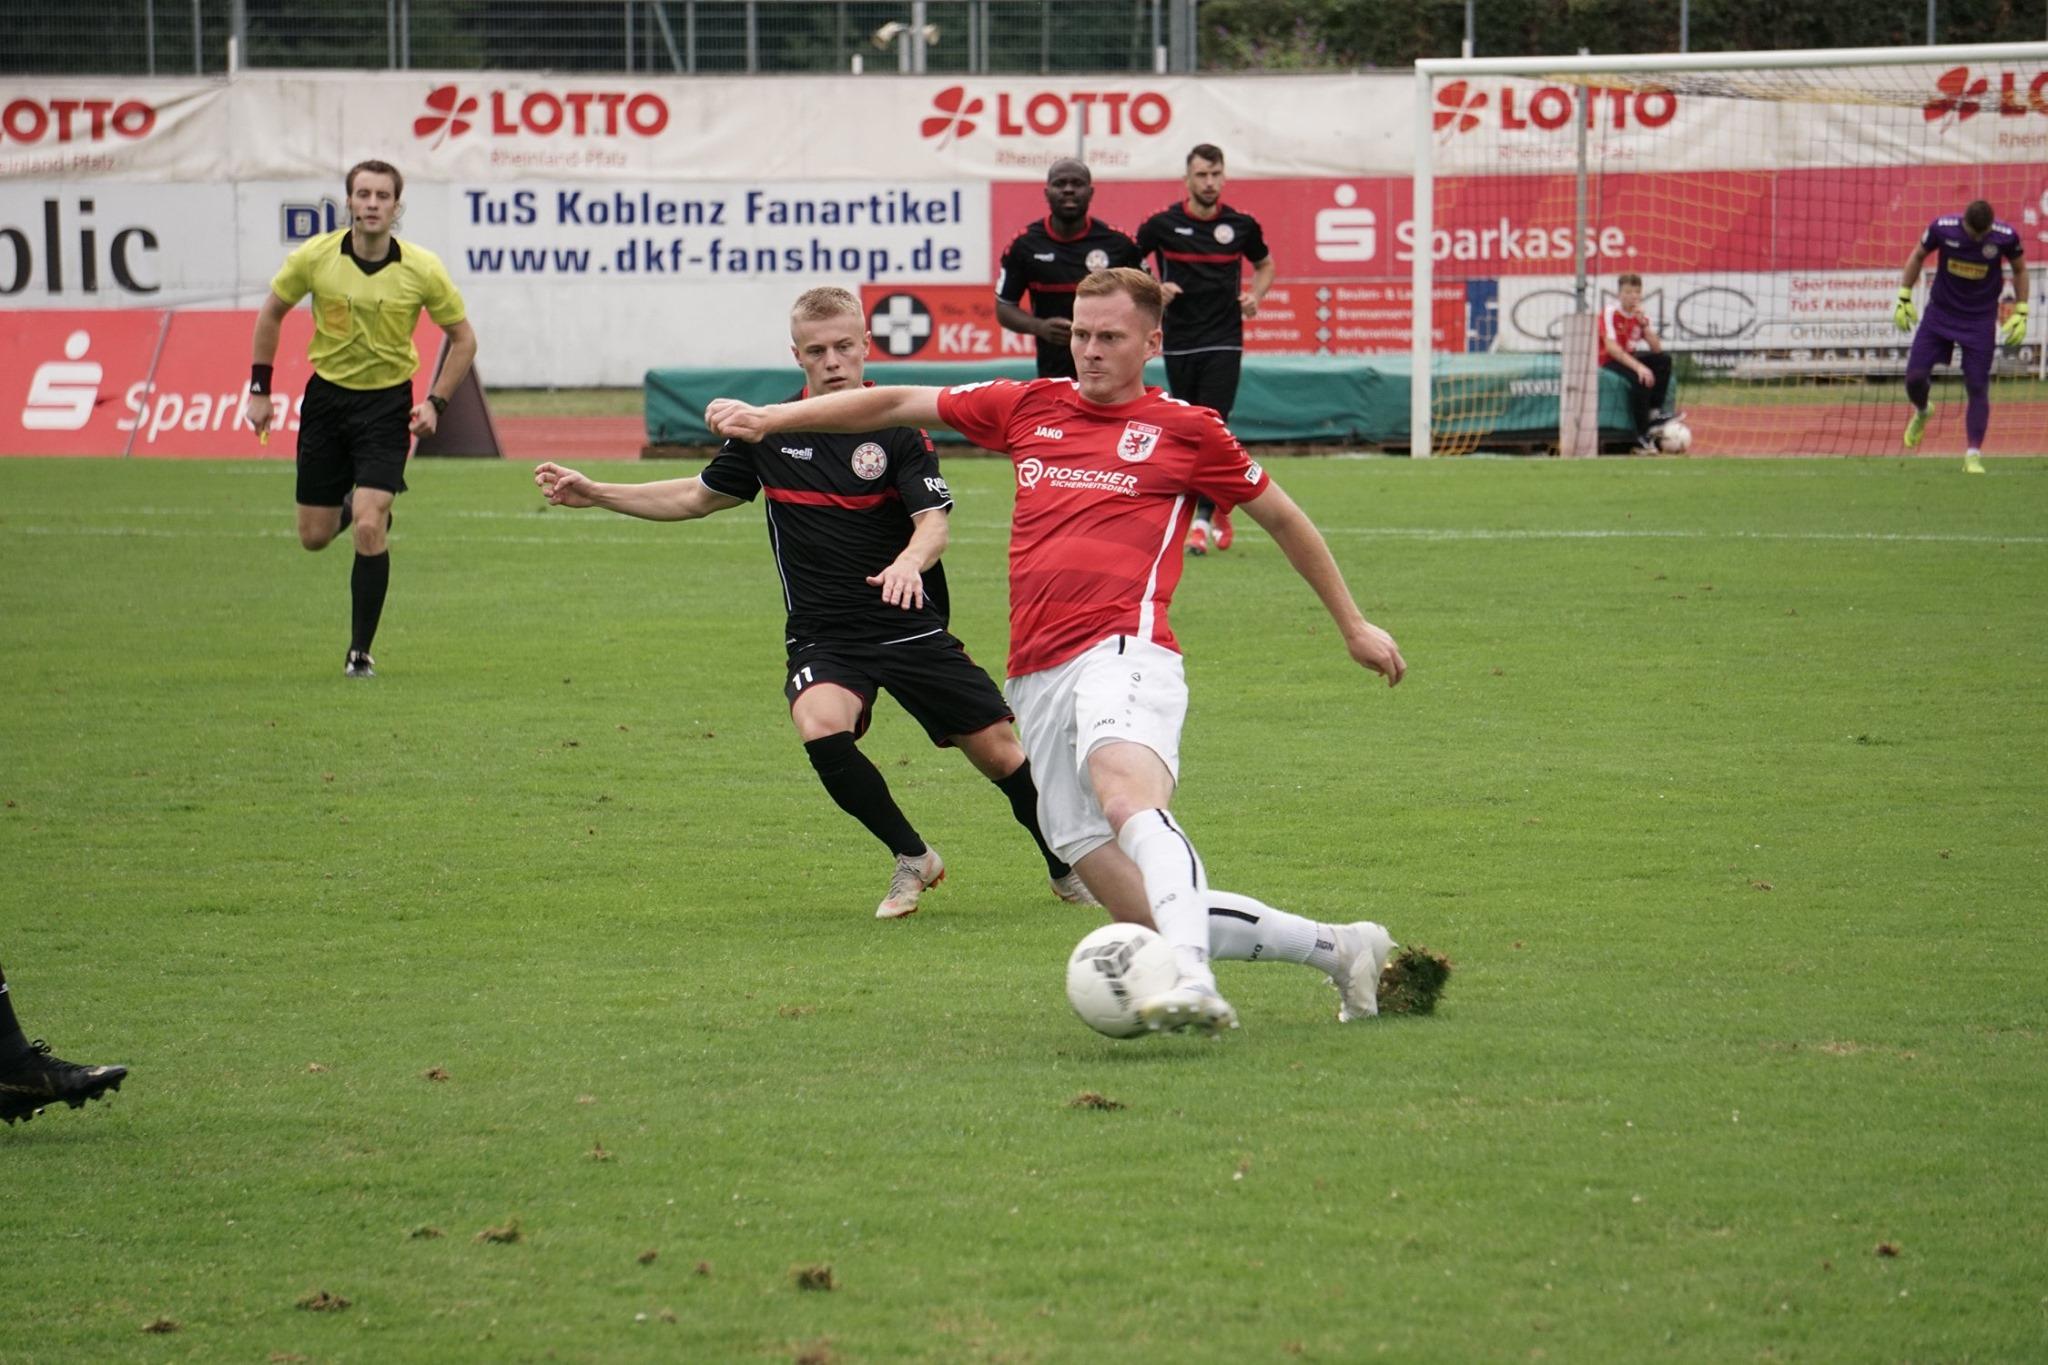 Rinderknecht verlässt den FC Gießen